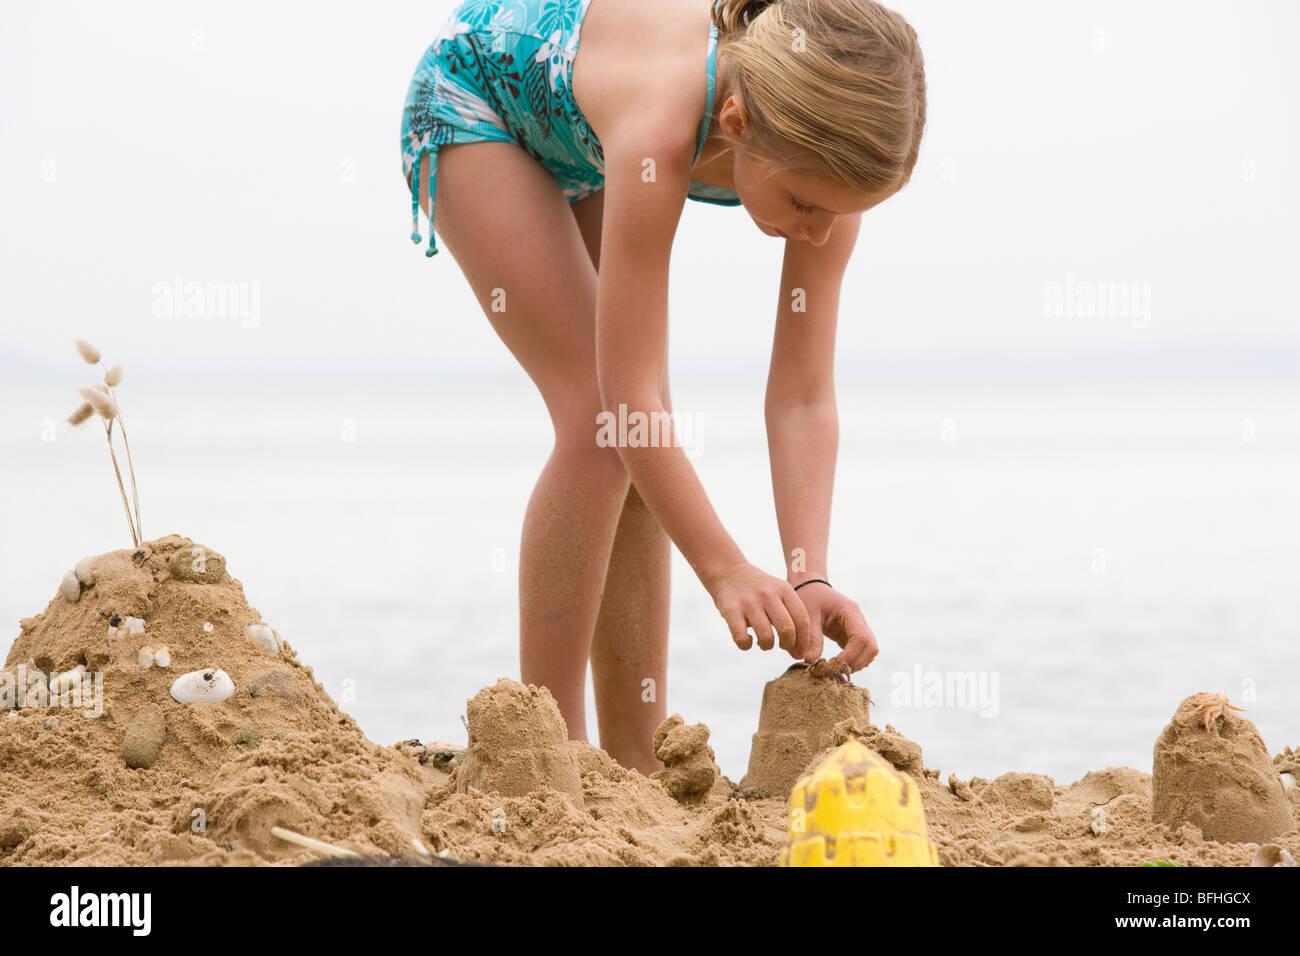 teen girl blonde on beach stock photos teen girl blonde on beach stock images alamy. Black Bedroom Furniture Sets. Home Design Ideas